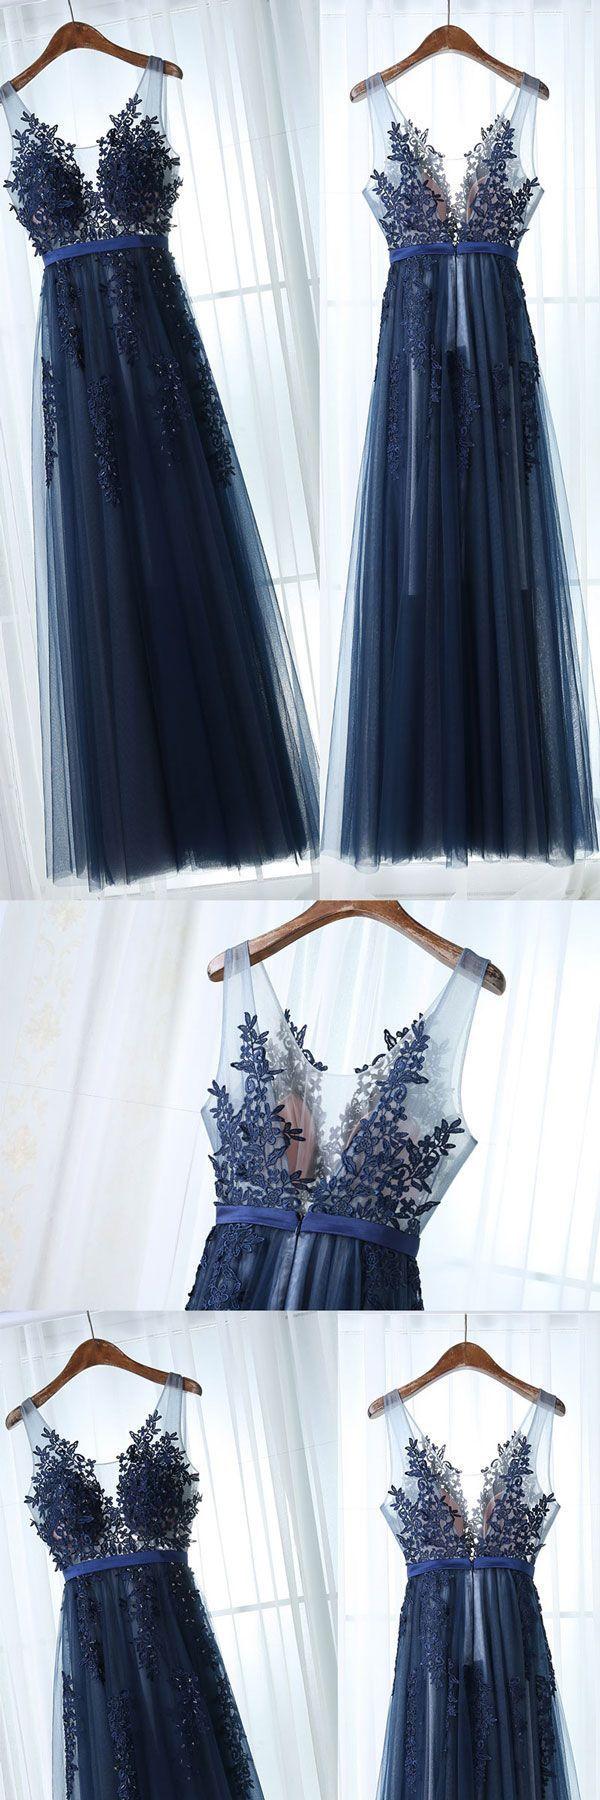 dark blue tulle lace long prom dress, dark blue bridesmaid dress